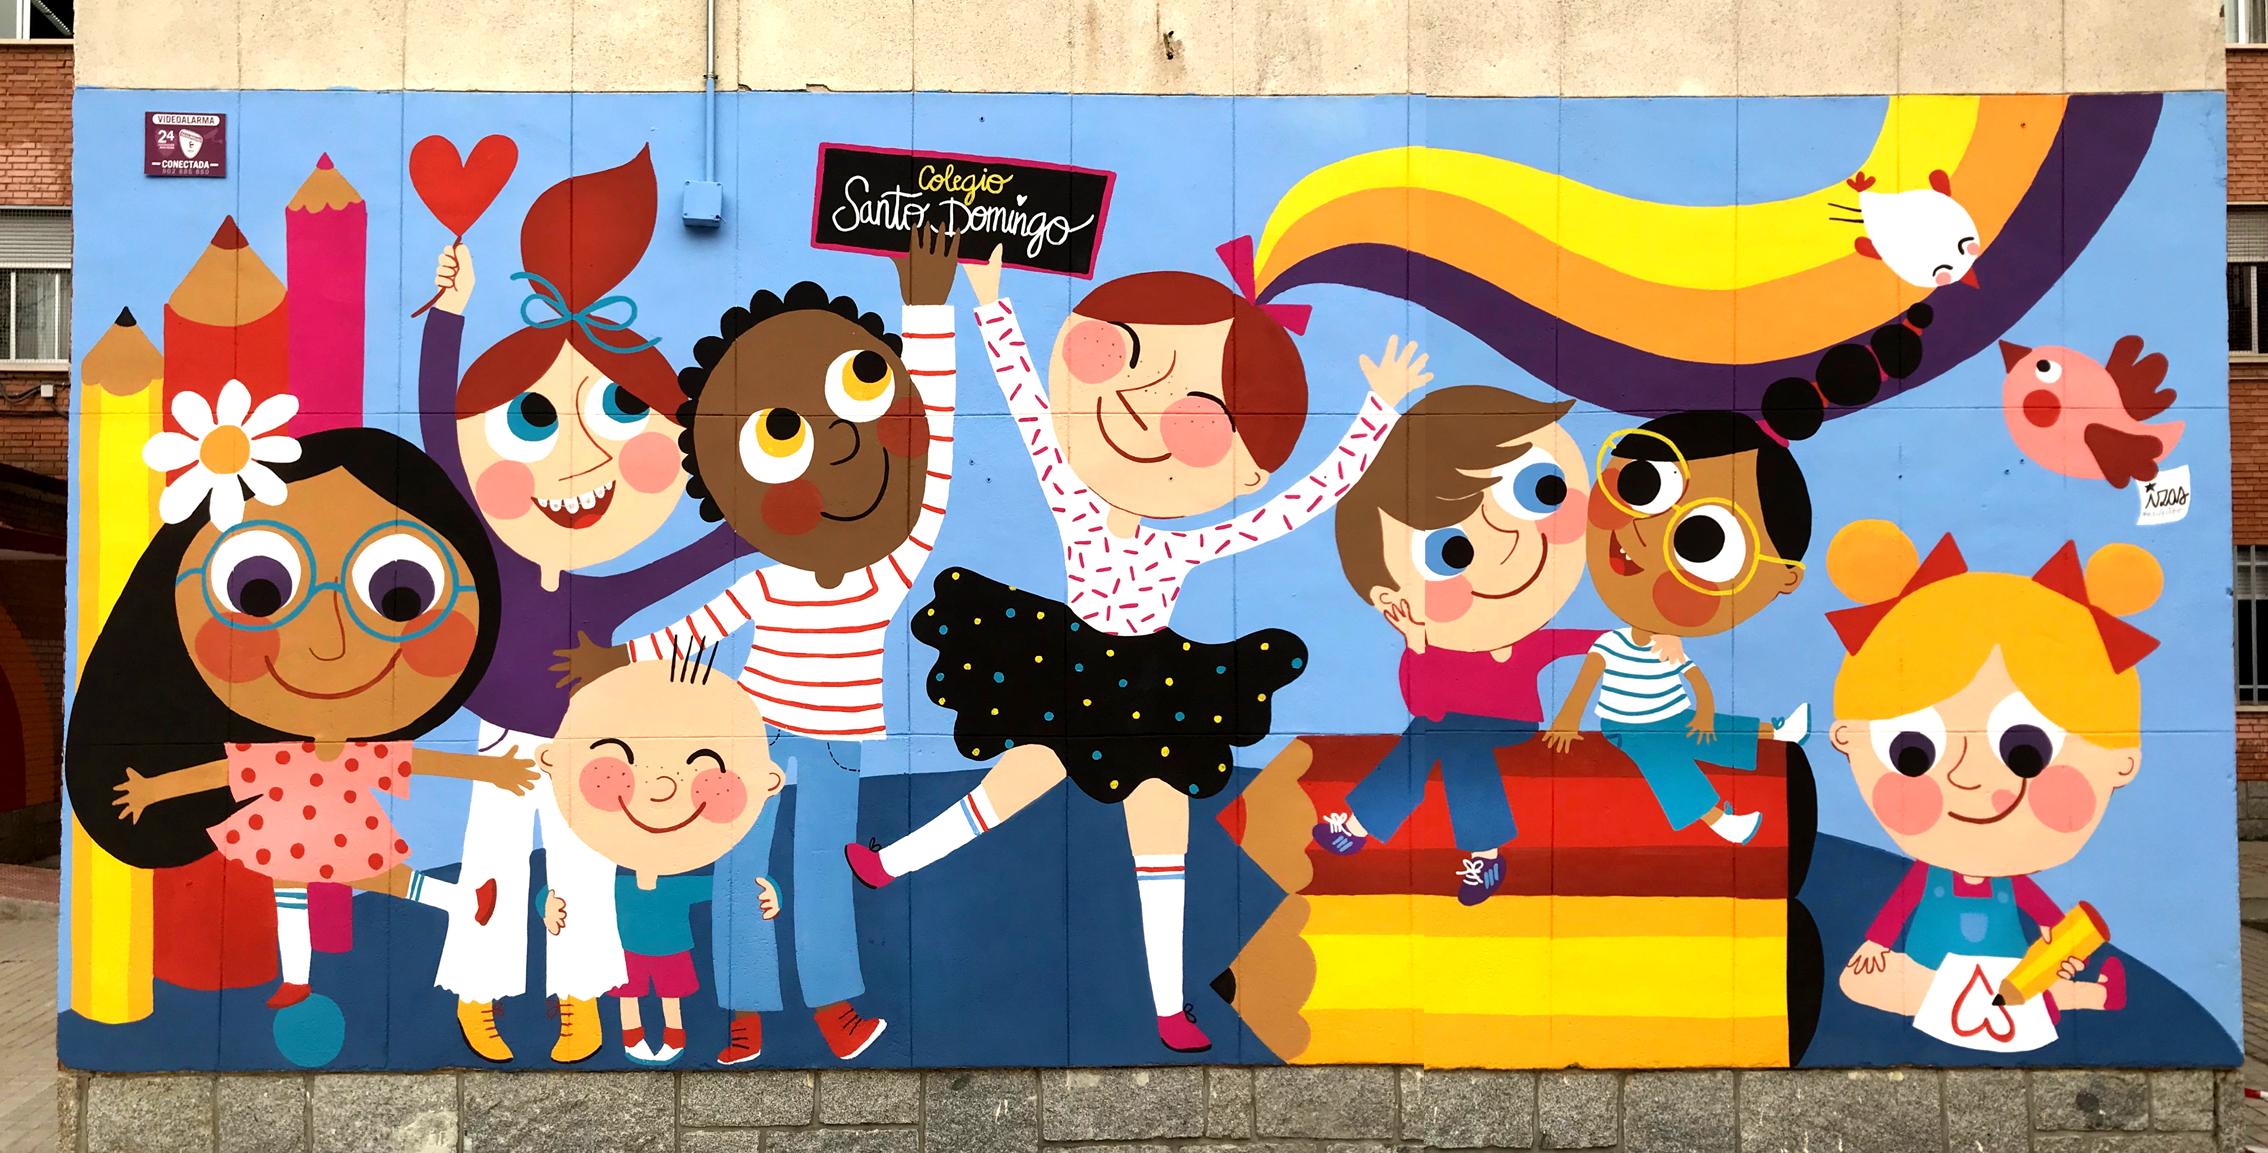 mural izas azulpatio ceip santo domingo niños pano